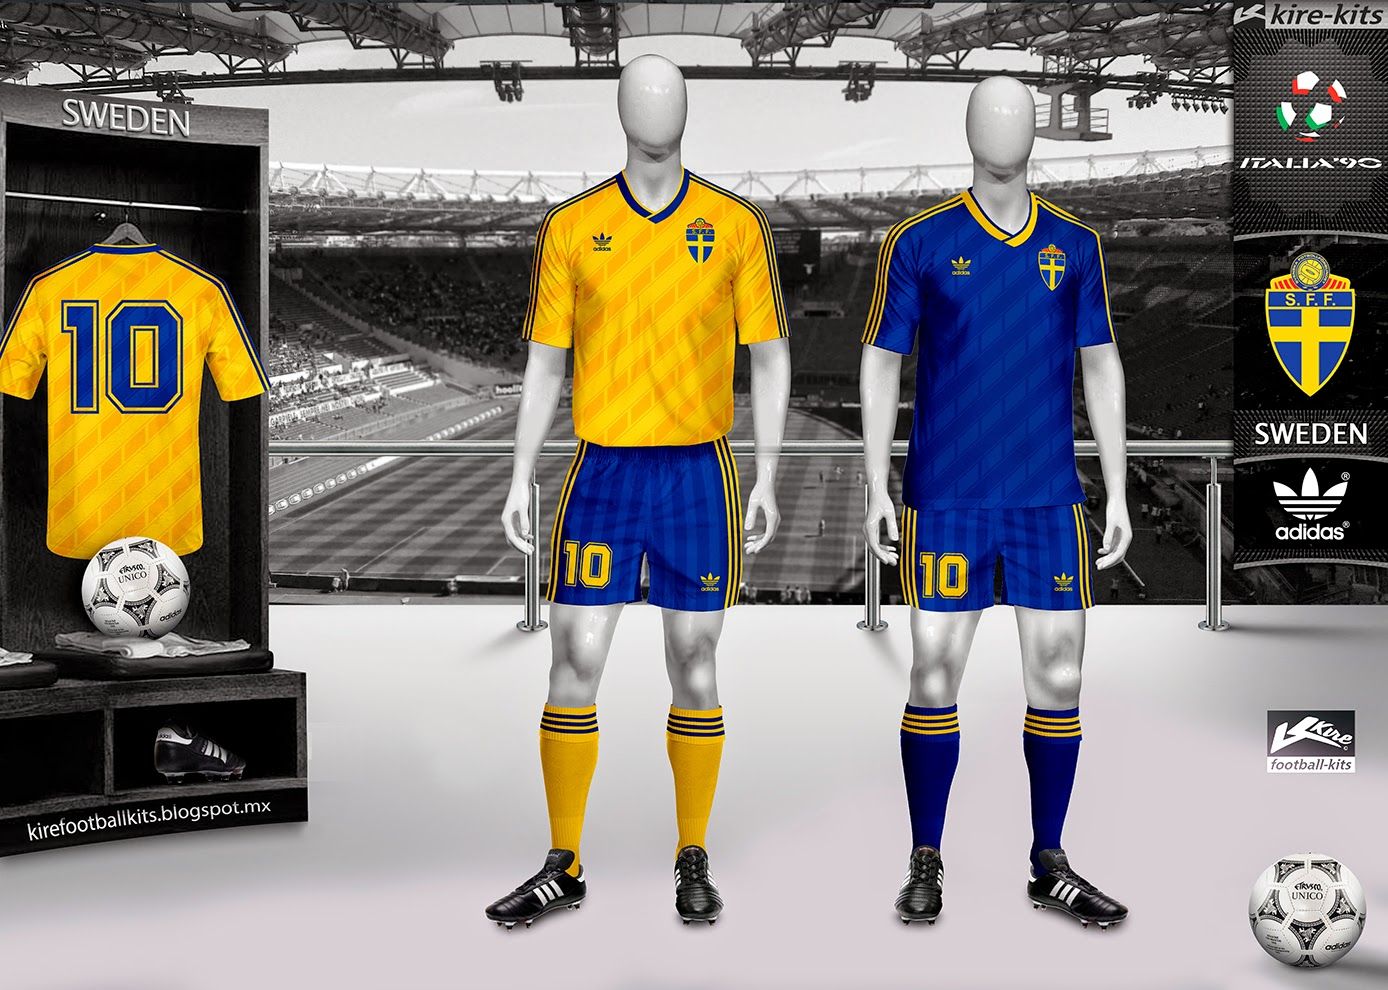 Kire Football Kits Sweden Kits World Cup 1990